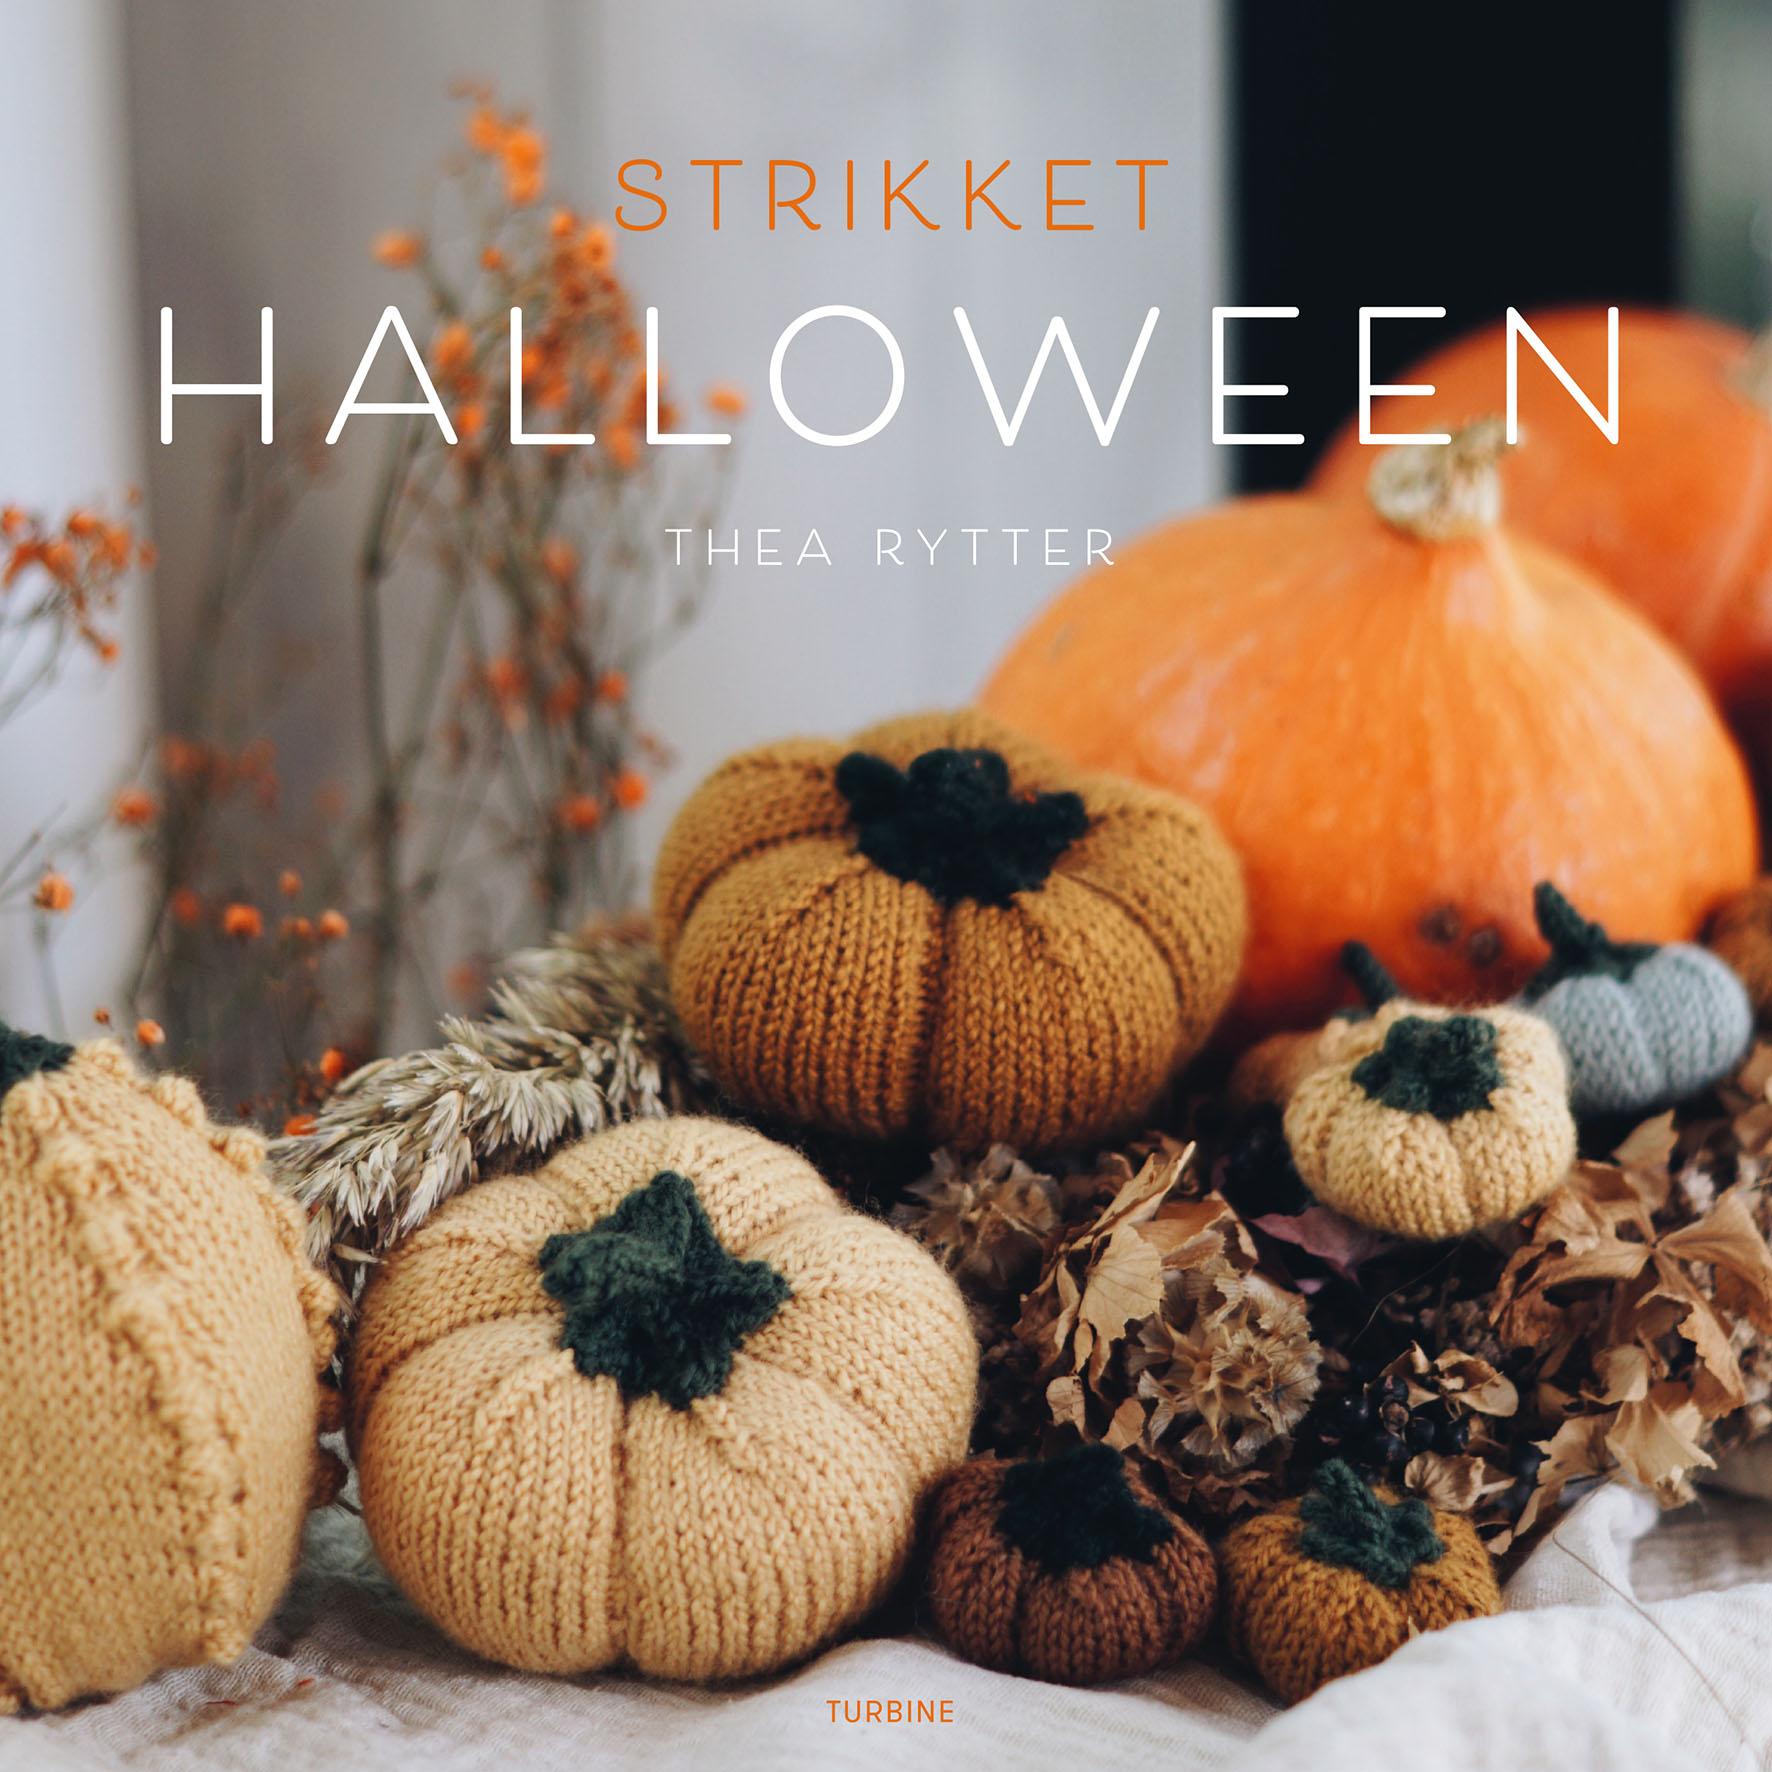 Strikket halloween - Thea Rytter - Bøger - Turbine - 9788740673593 - August 27, 2021